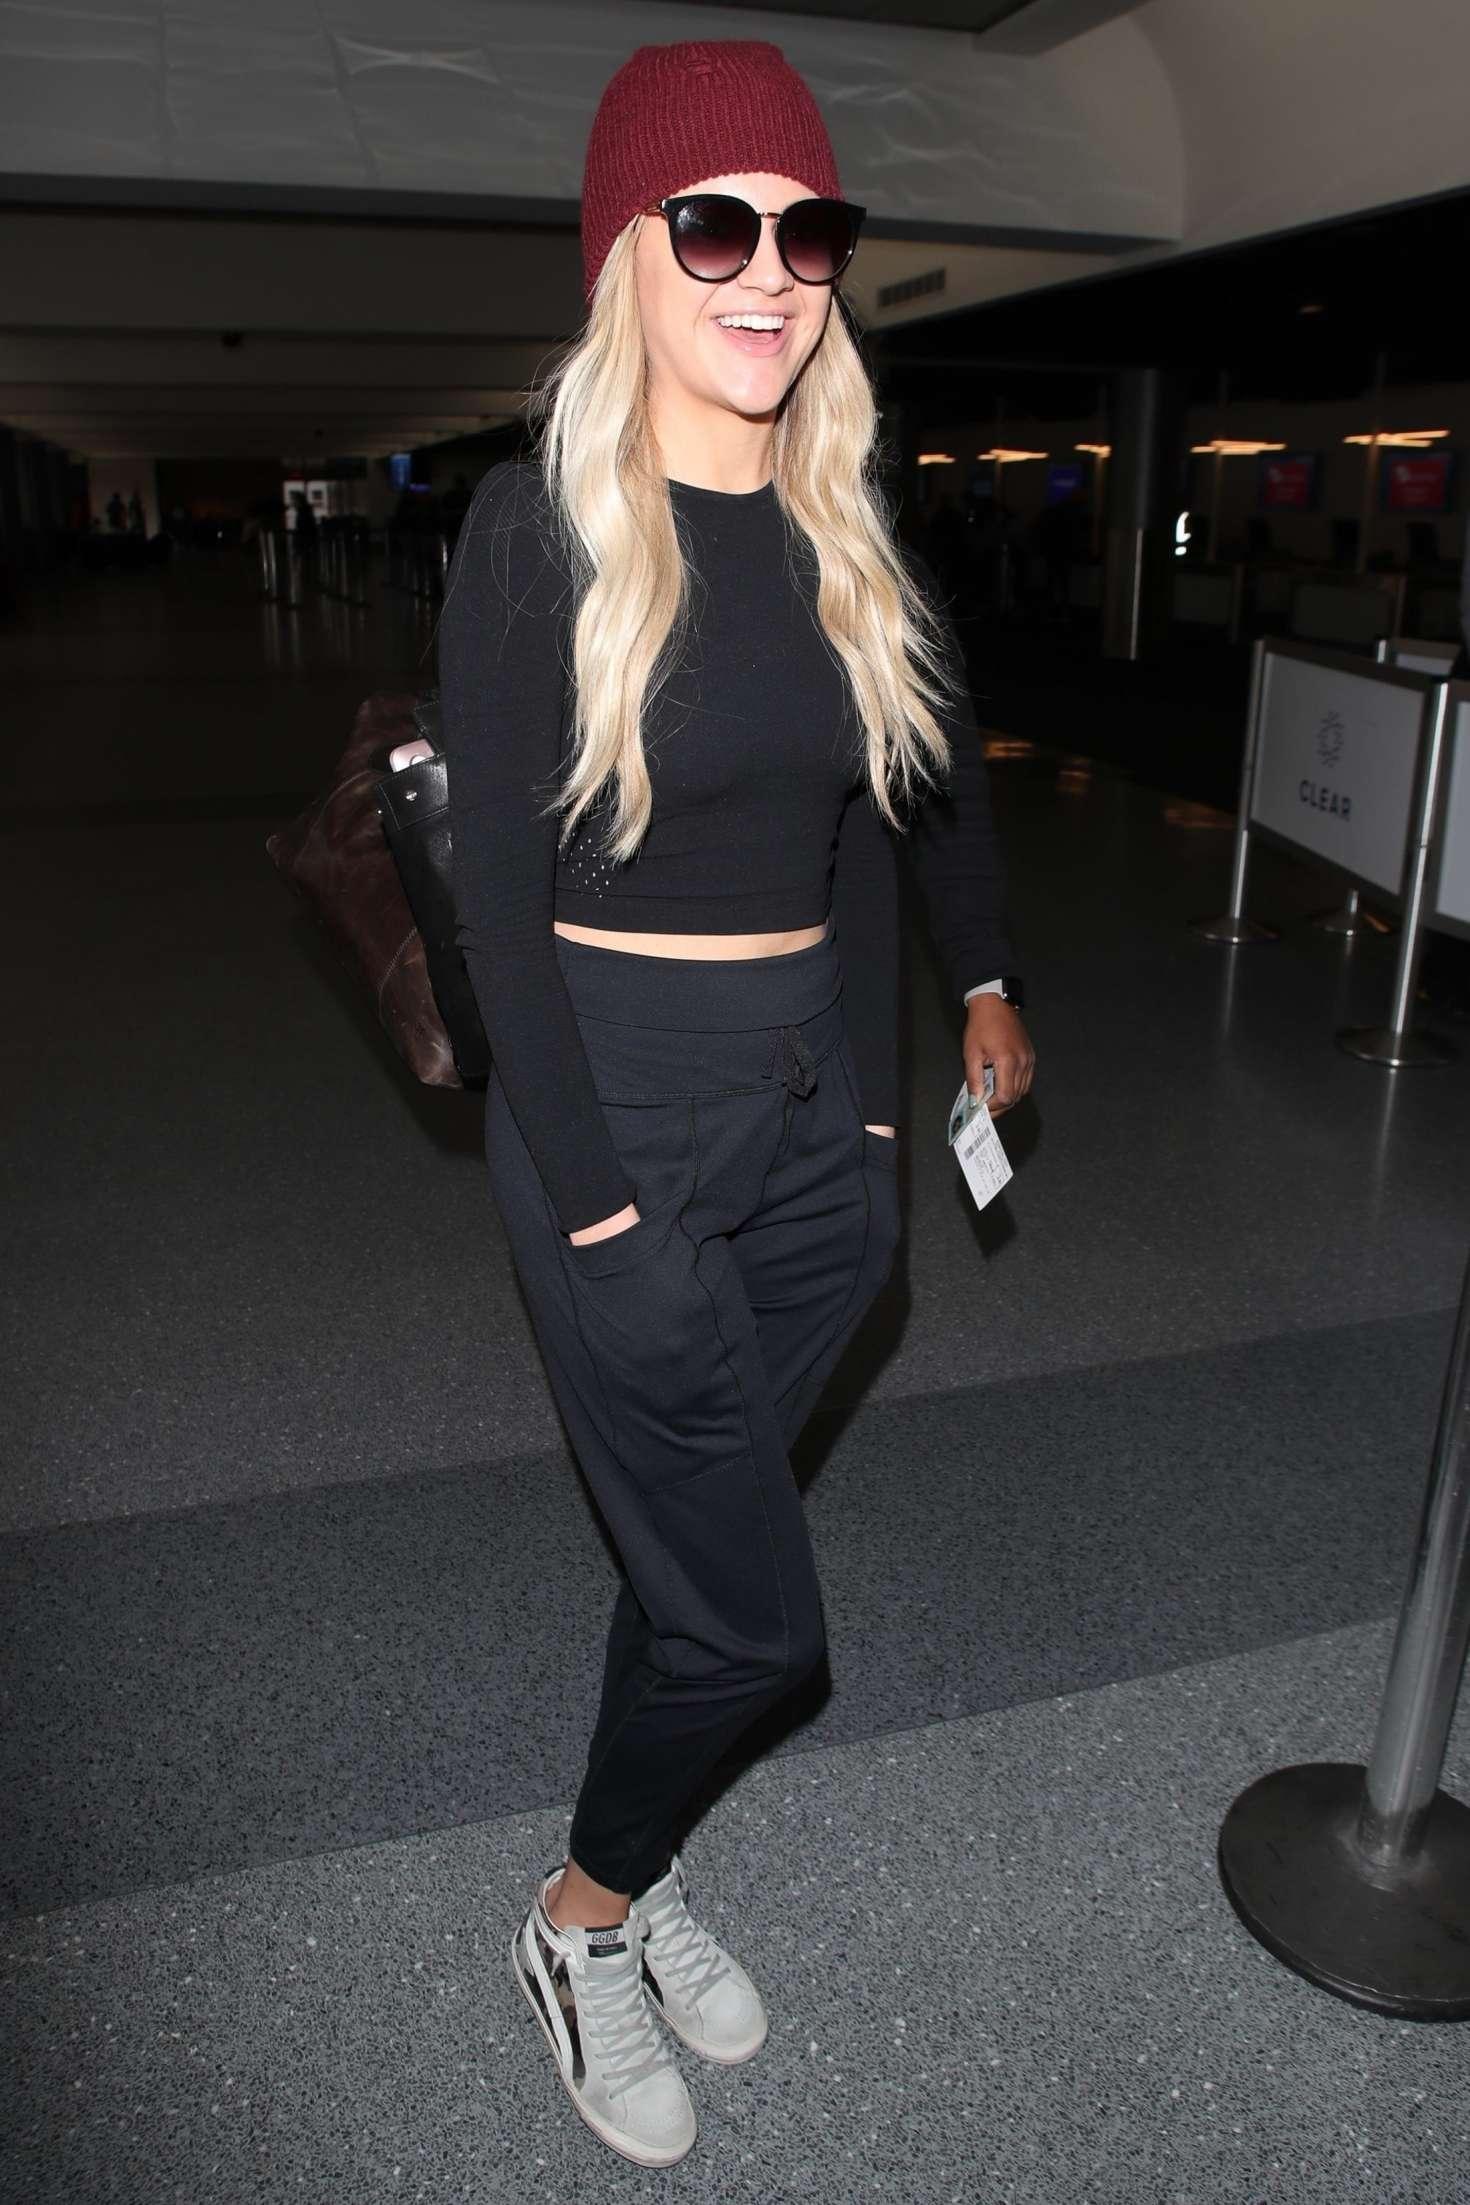 Kelsea Ballerini - Arrives at LAX Airport in LA